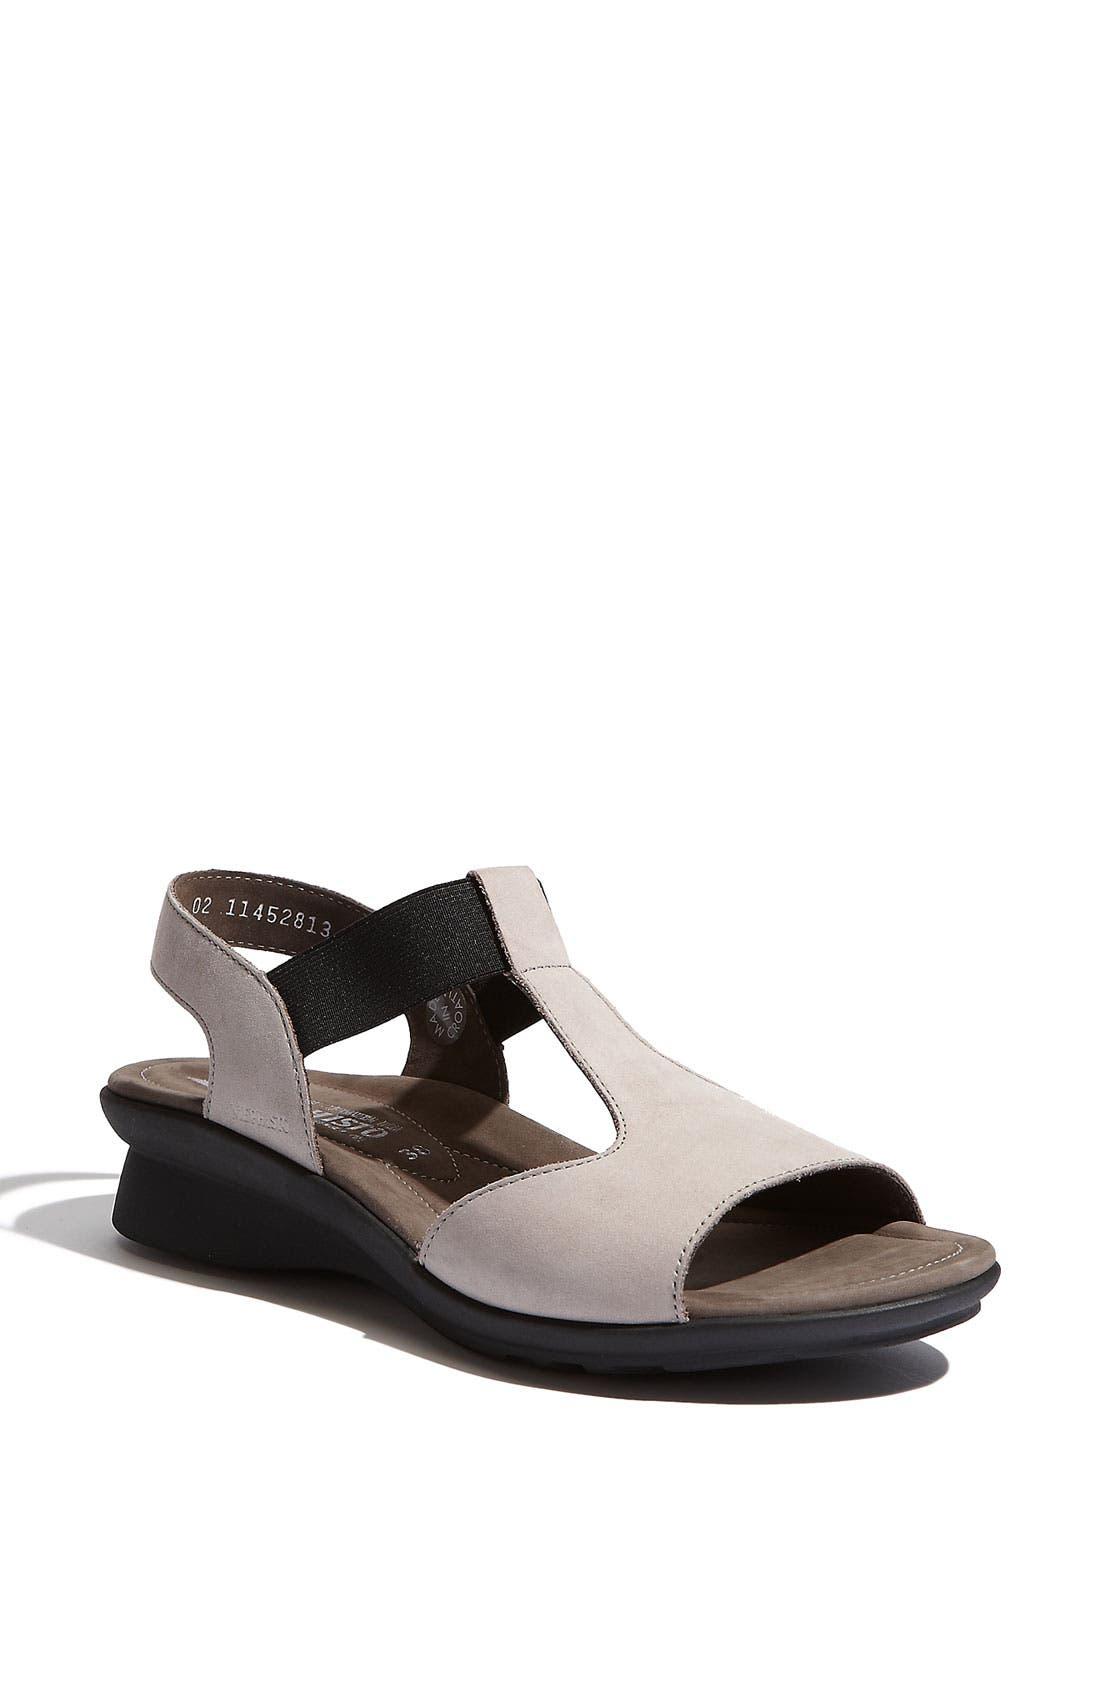 Main Image - Mephisto 'Petrea' Sandal